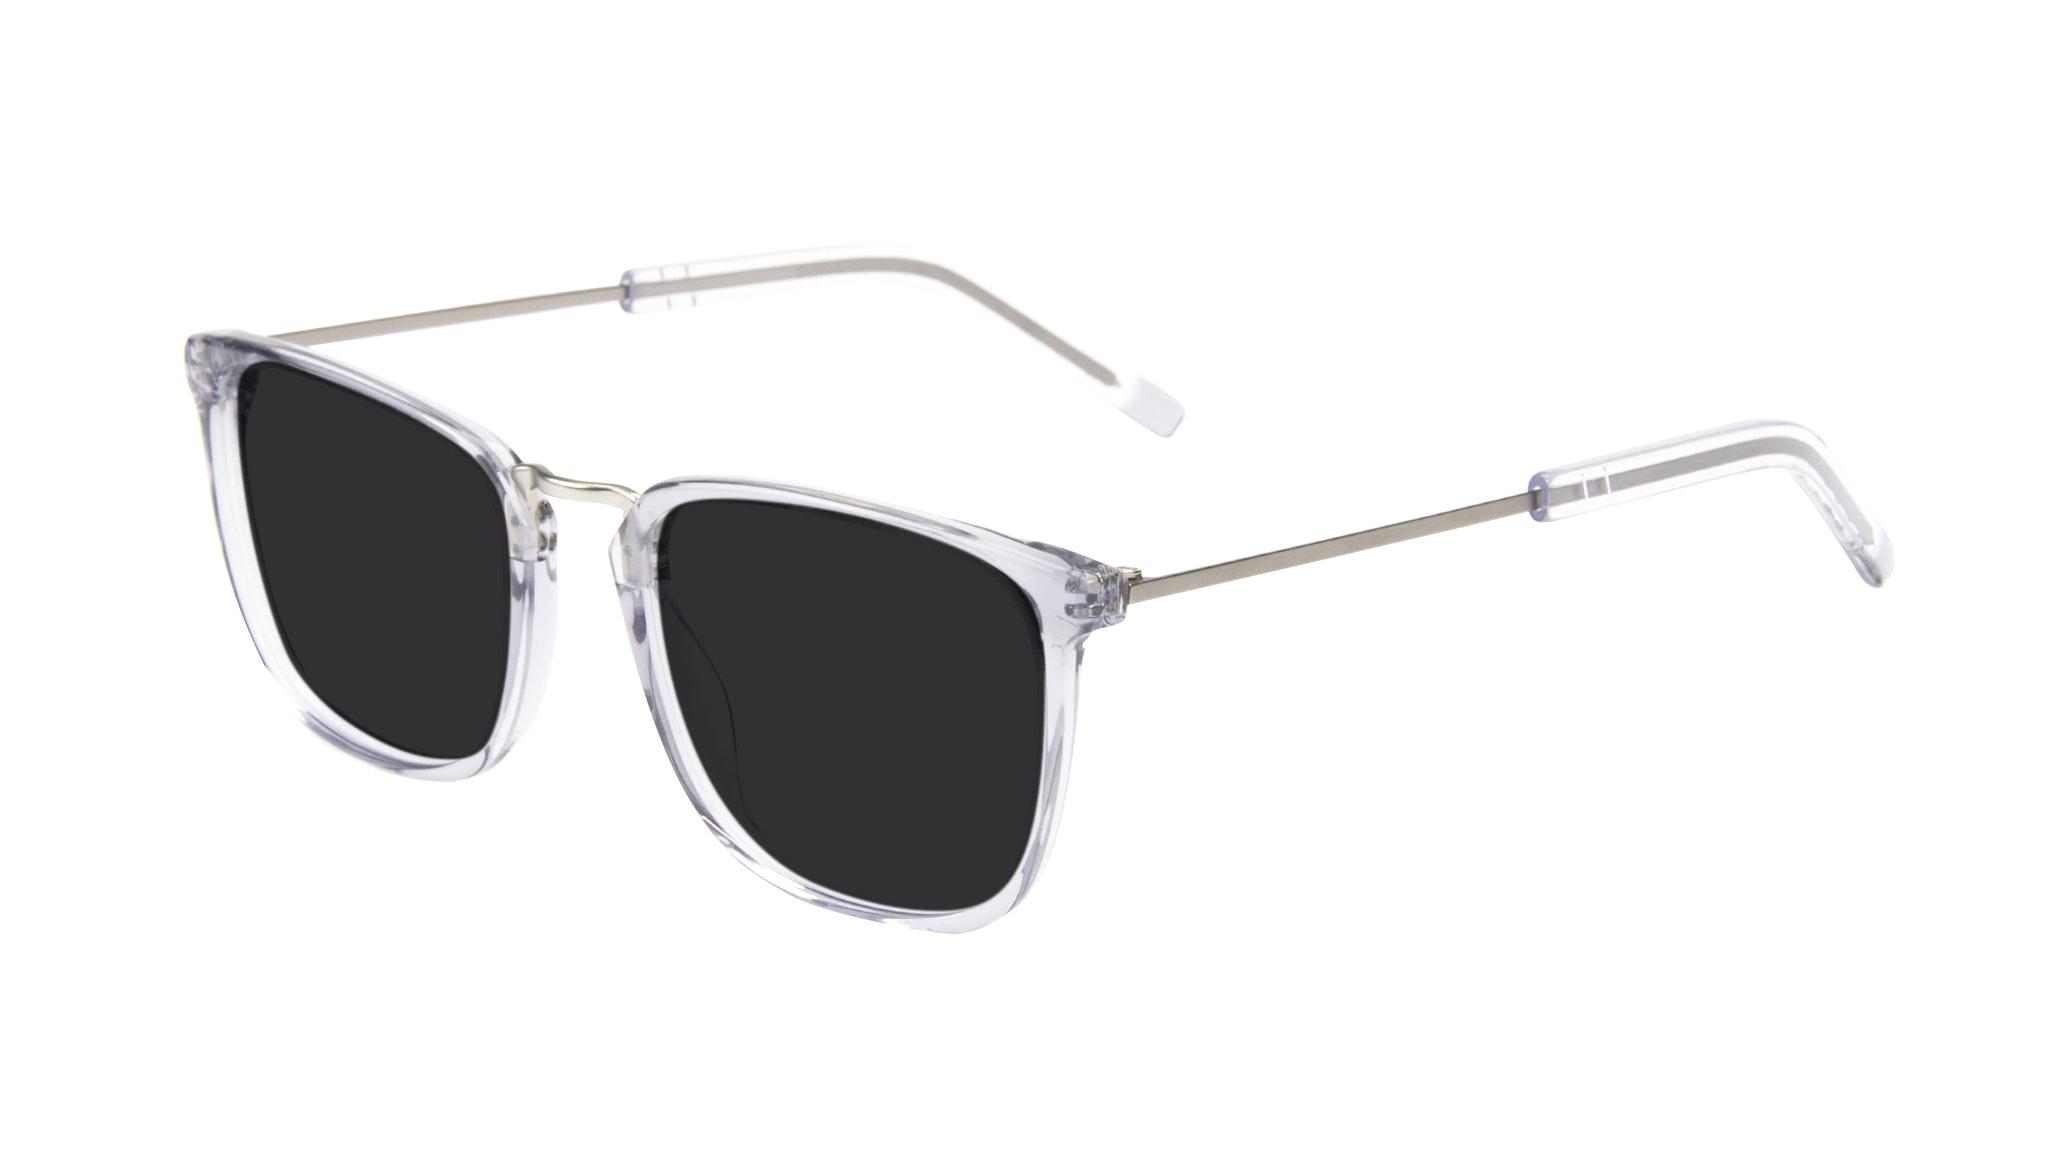 Affordable Fashion Glasses Rectangle Square Sunglasses Men Current Steel Tilt